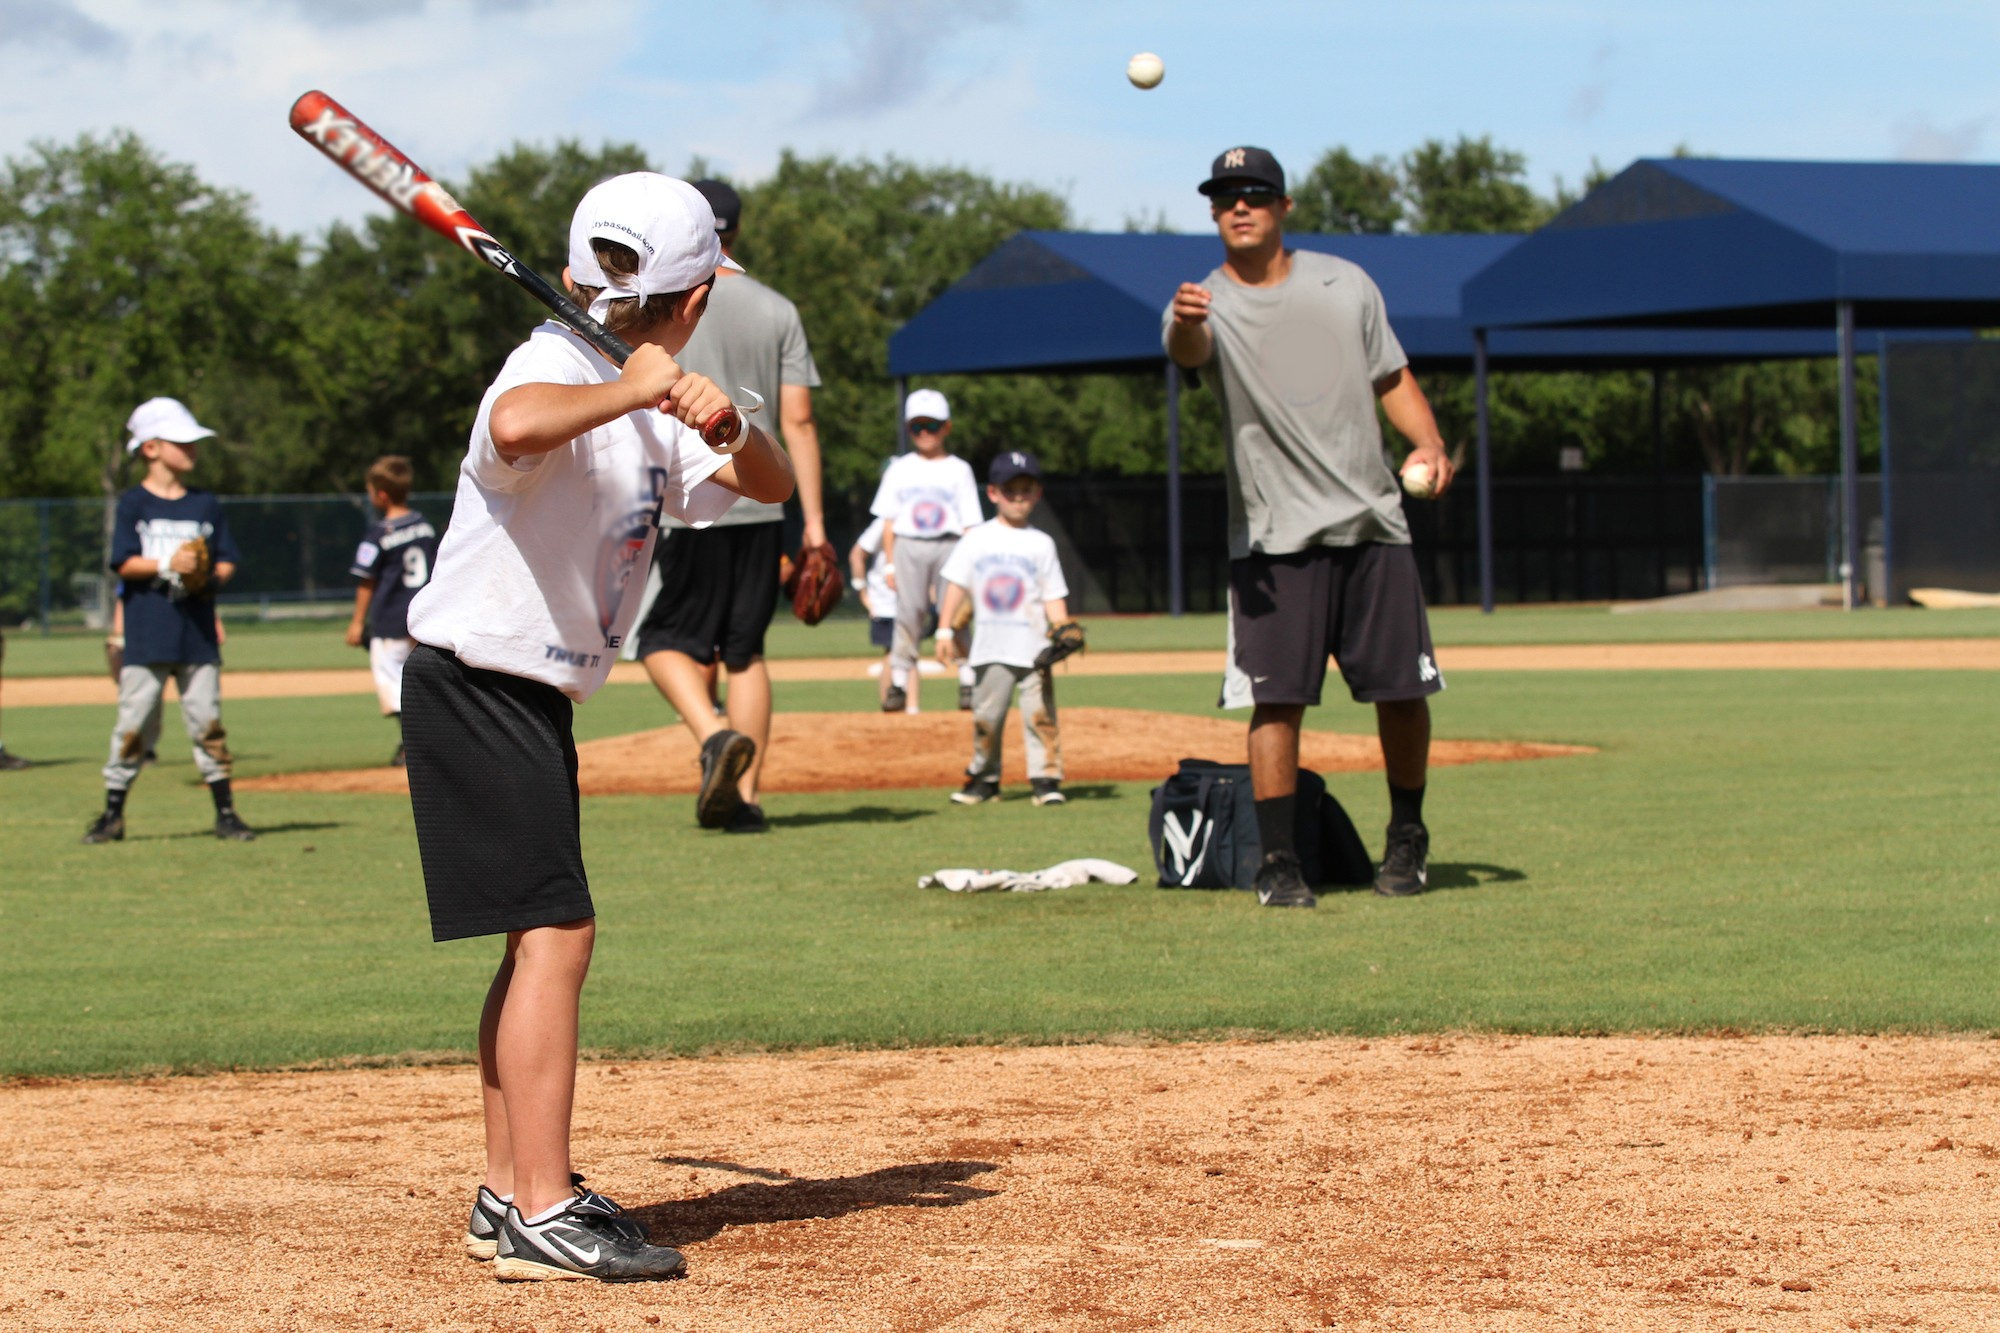 10 life lessons learned from baseball pro baseball insider - HD2000×1333